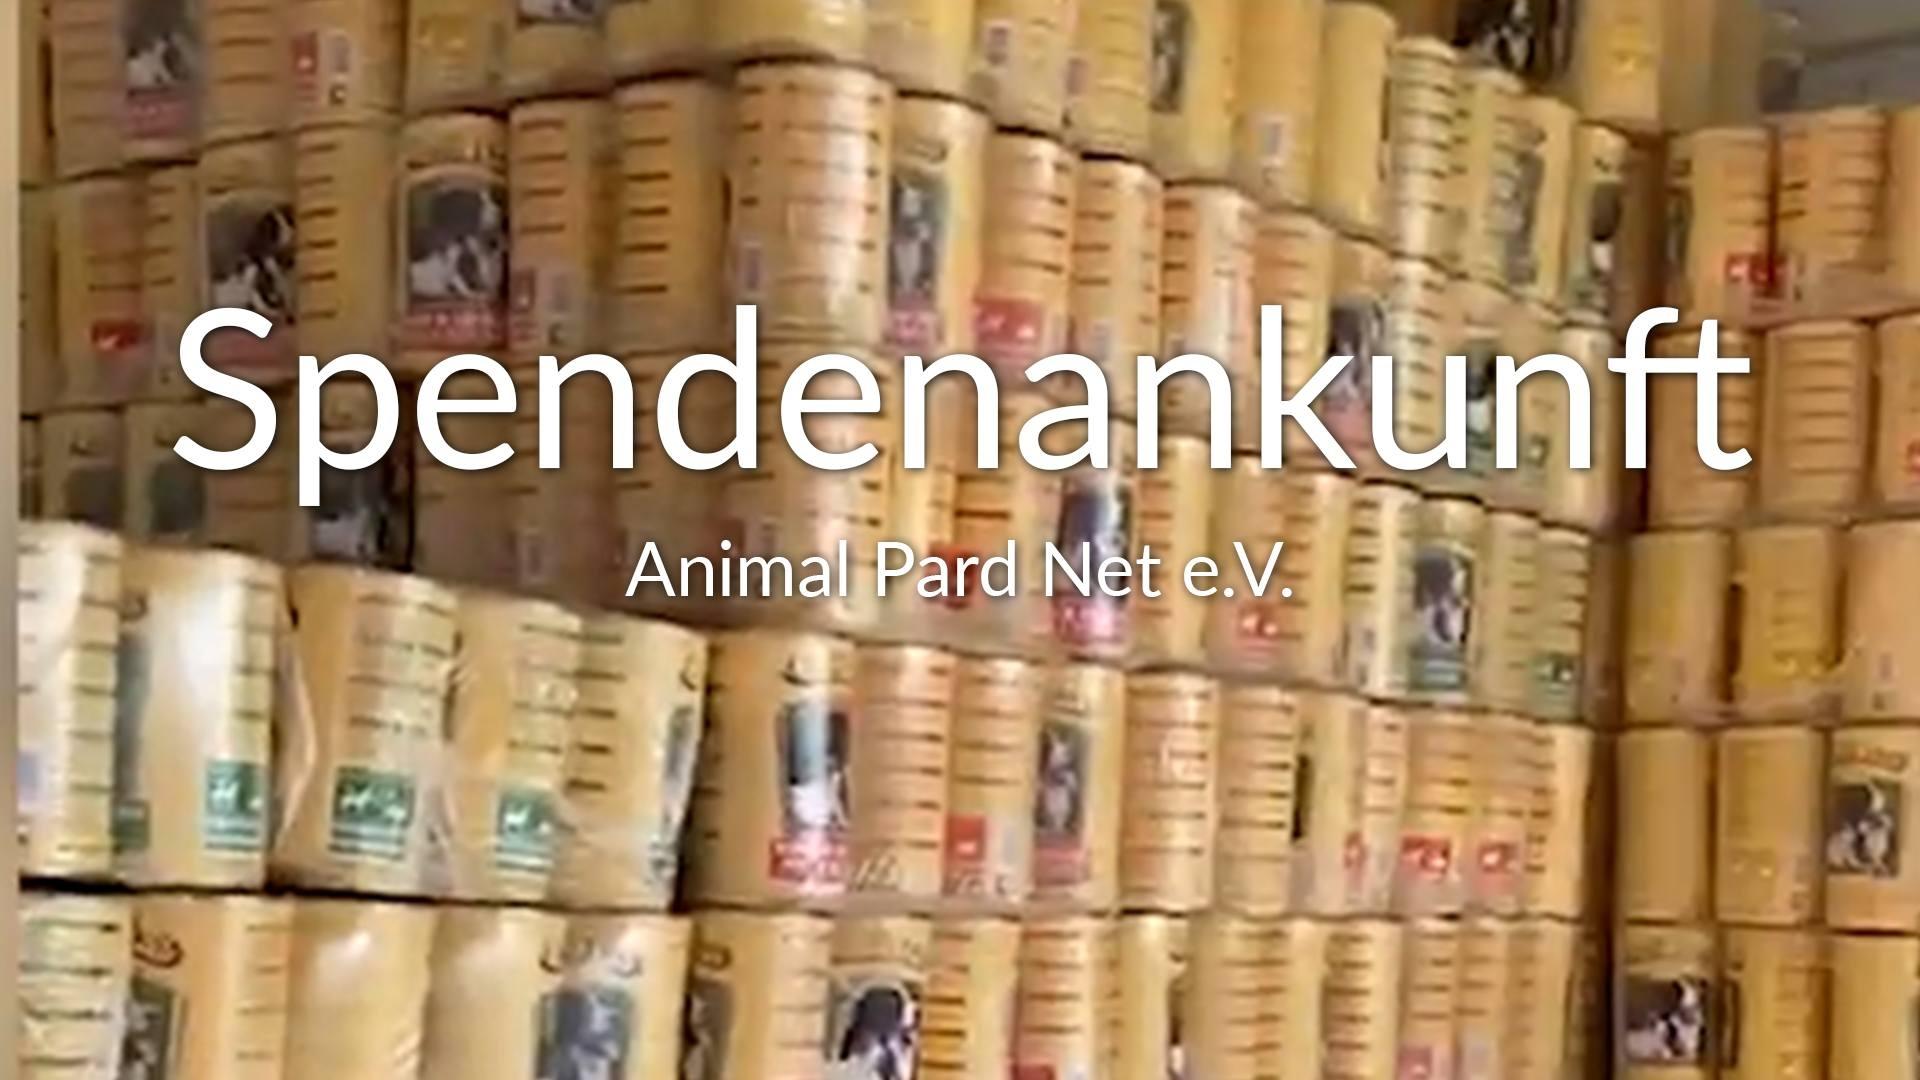 Animal Pard Net e.V.-Futterspendenankunft-maerz-2020-Spenden-Marathon-2019-Griechenland-VIDEO